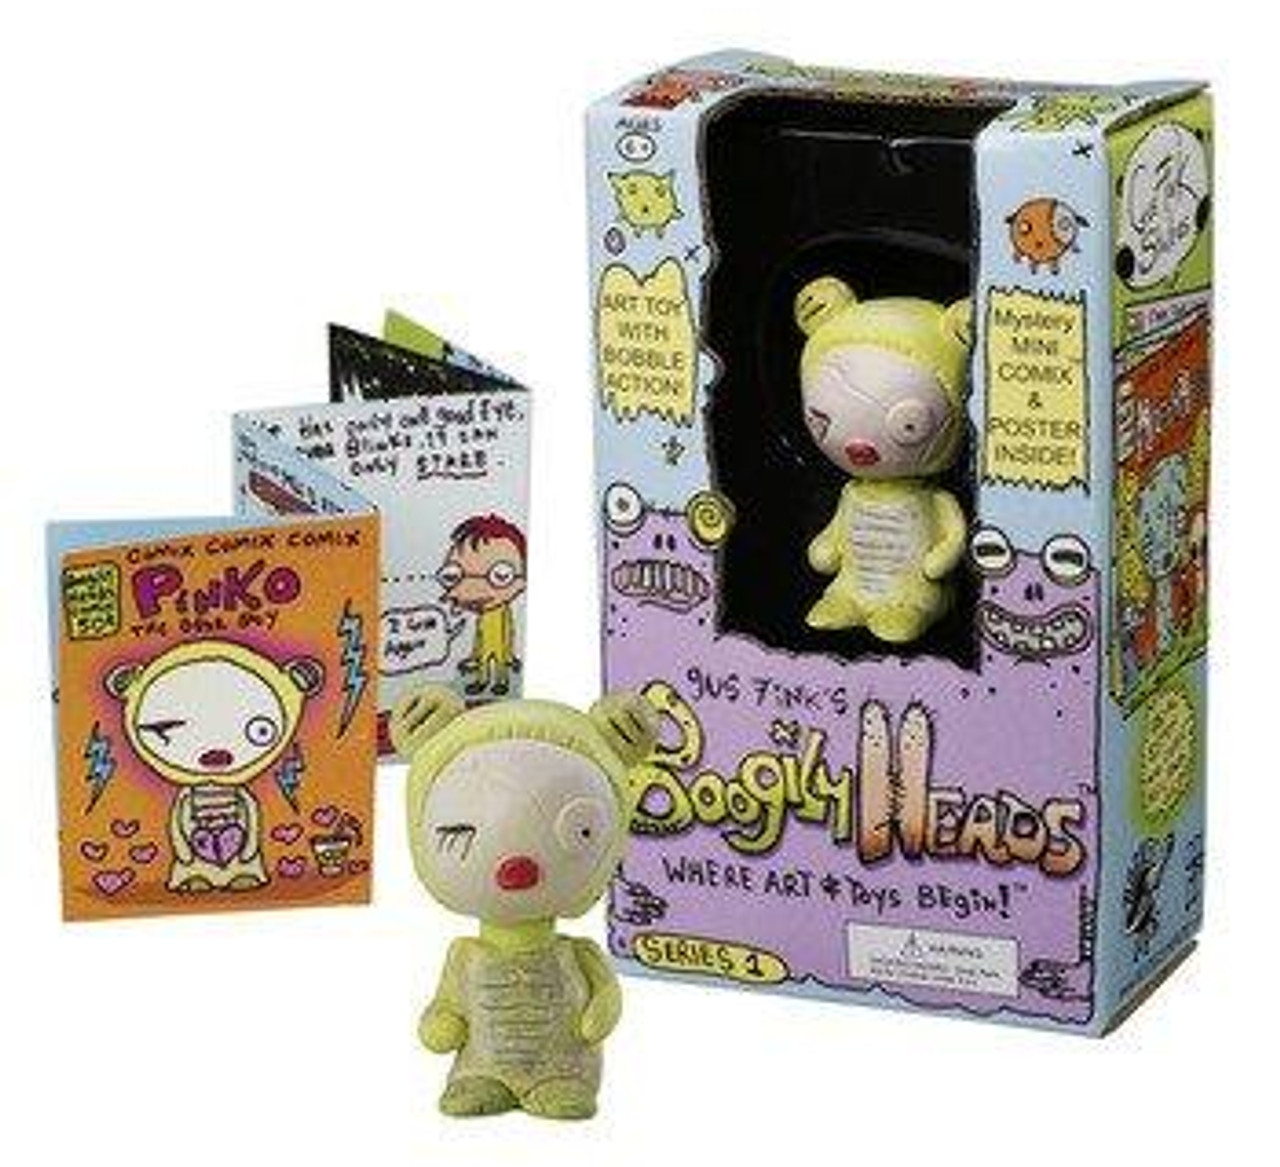 Funko Boogily Bunnies Series 1 Pinko Mini Bobble Head